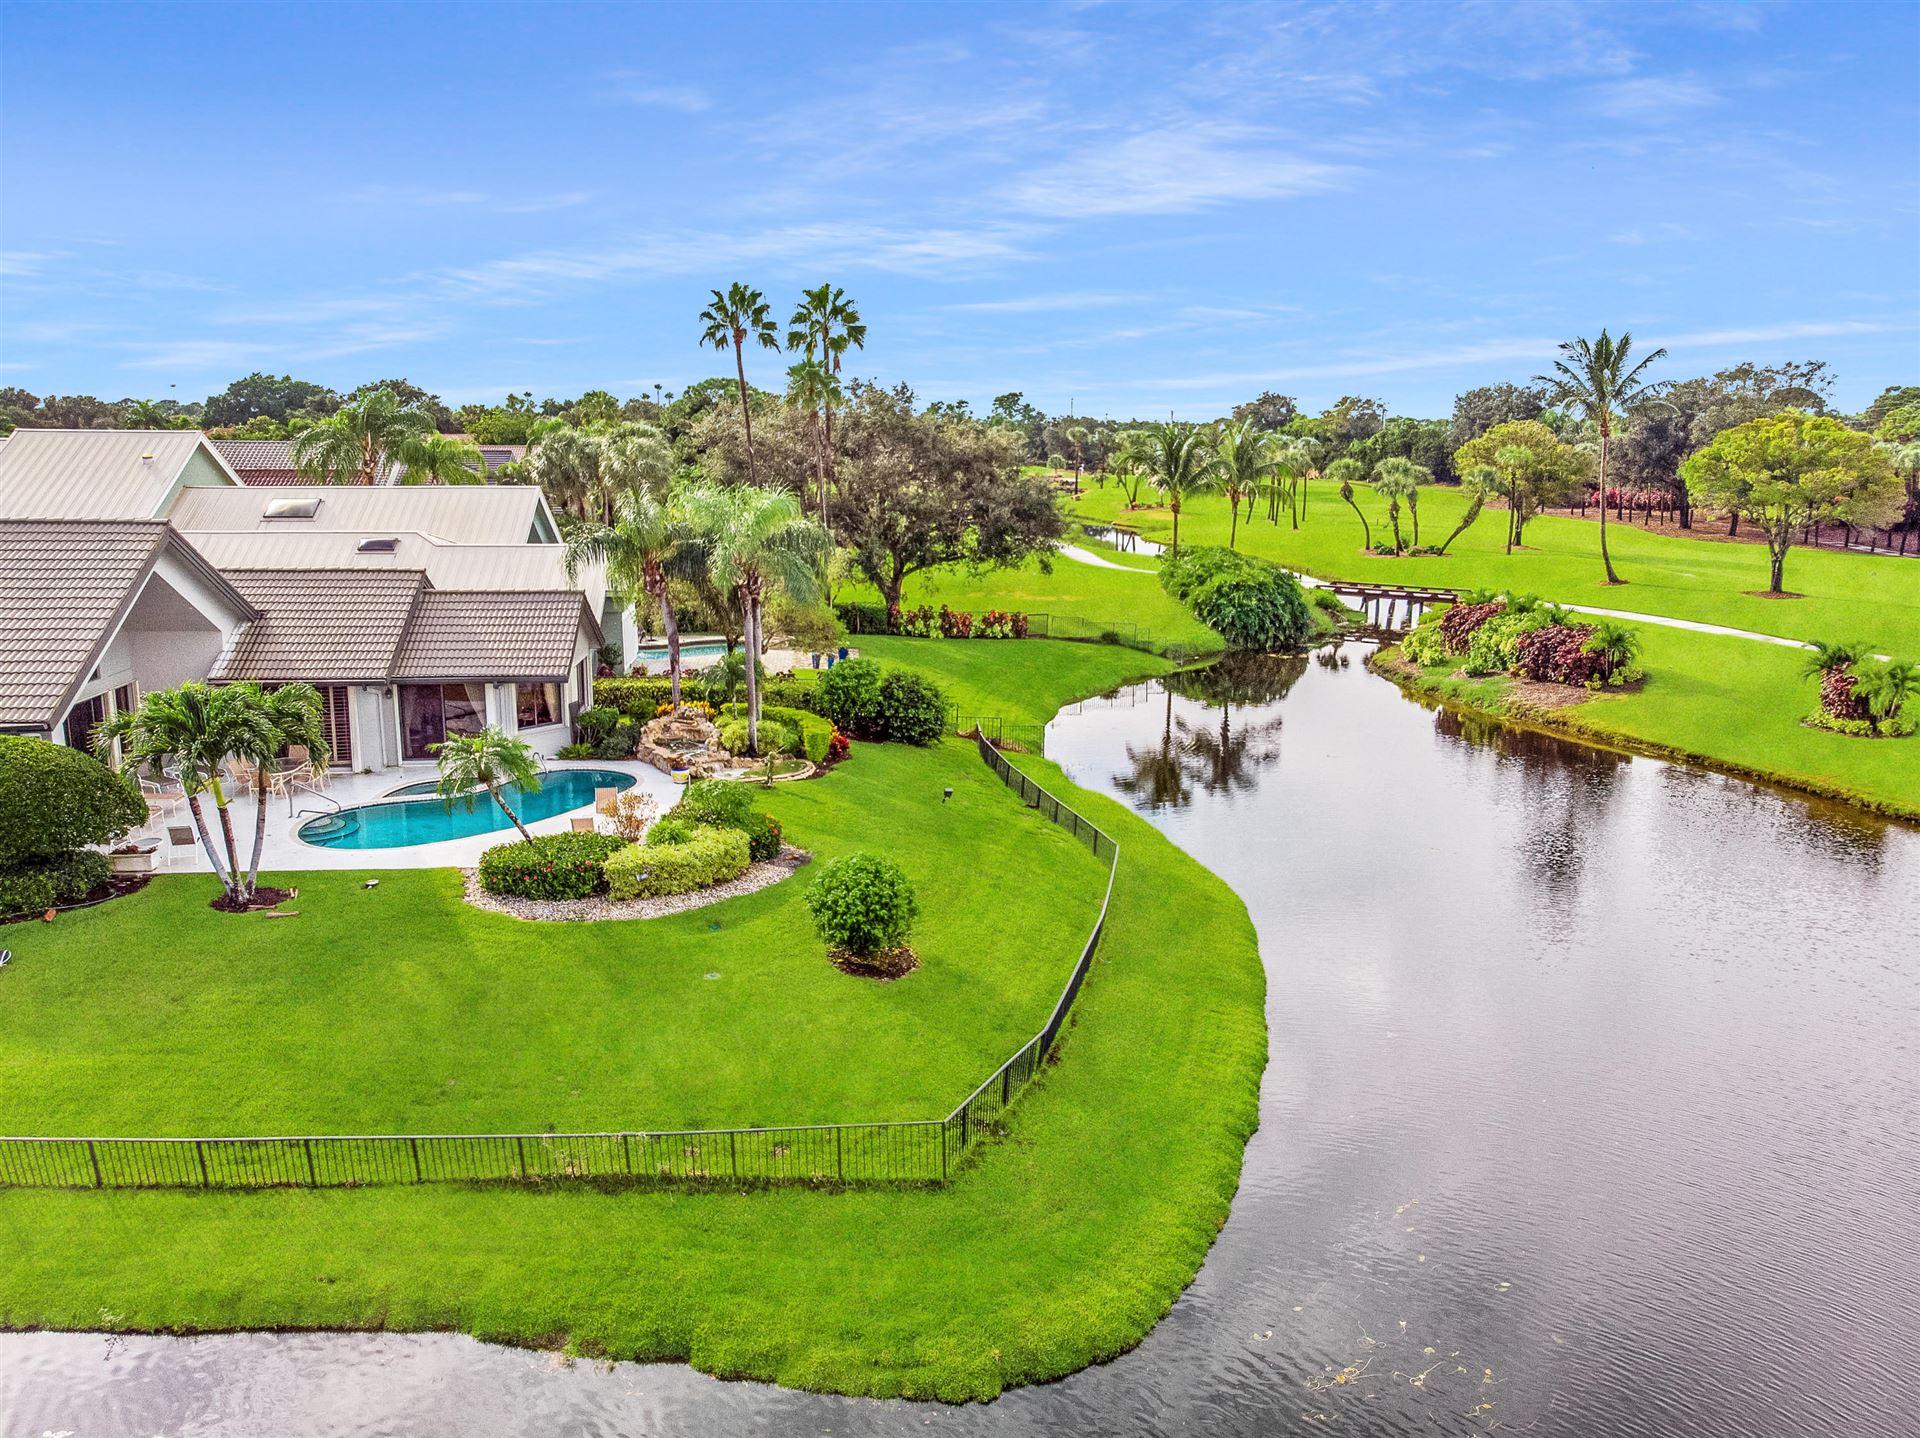 Photo of 13901 Rivoli Court, Palm Beach Gardens, FL 33410 (MLS # RX-10577018)